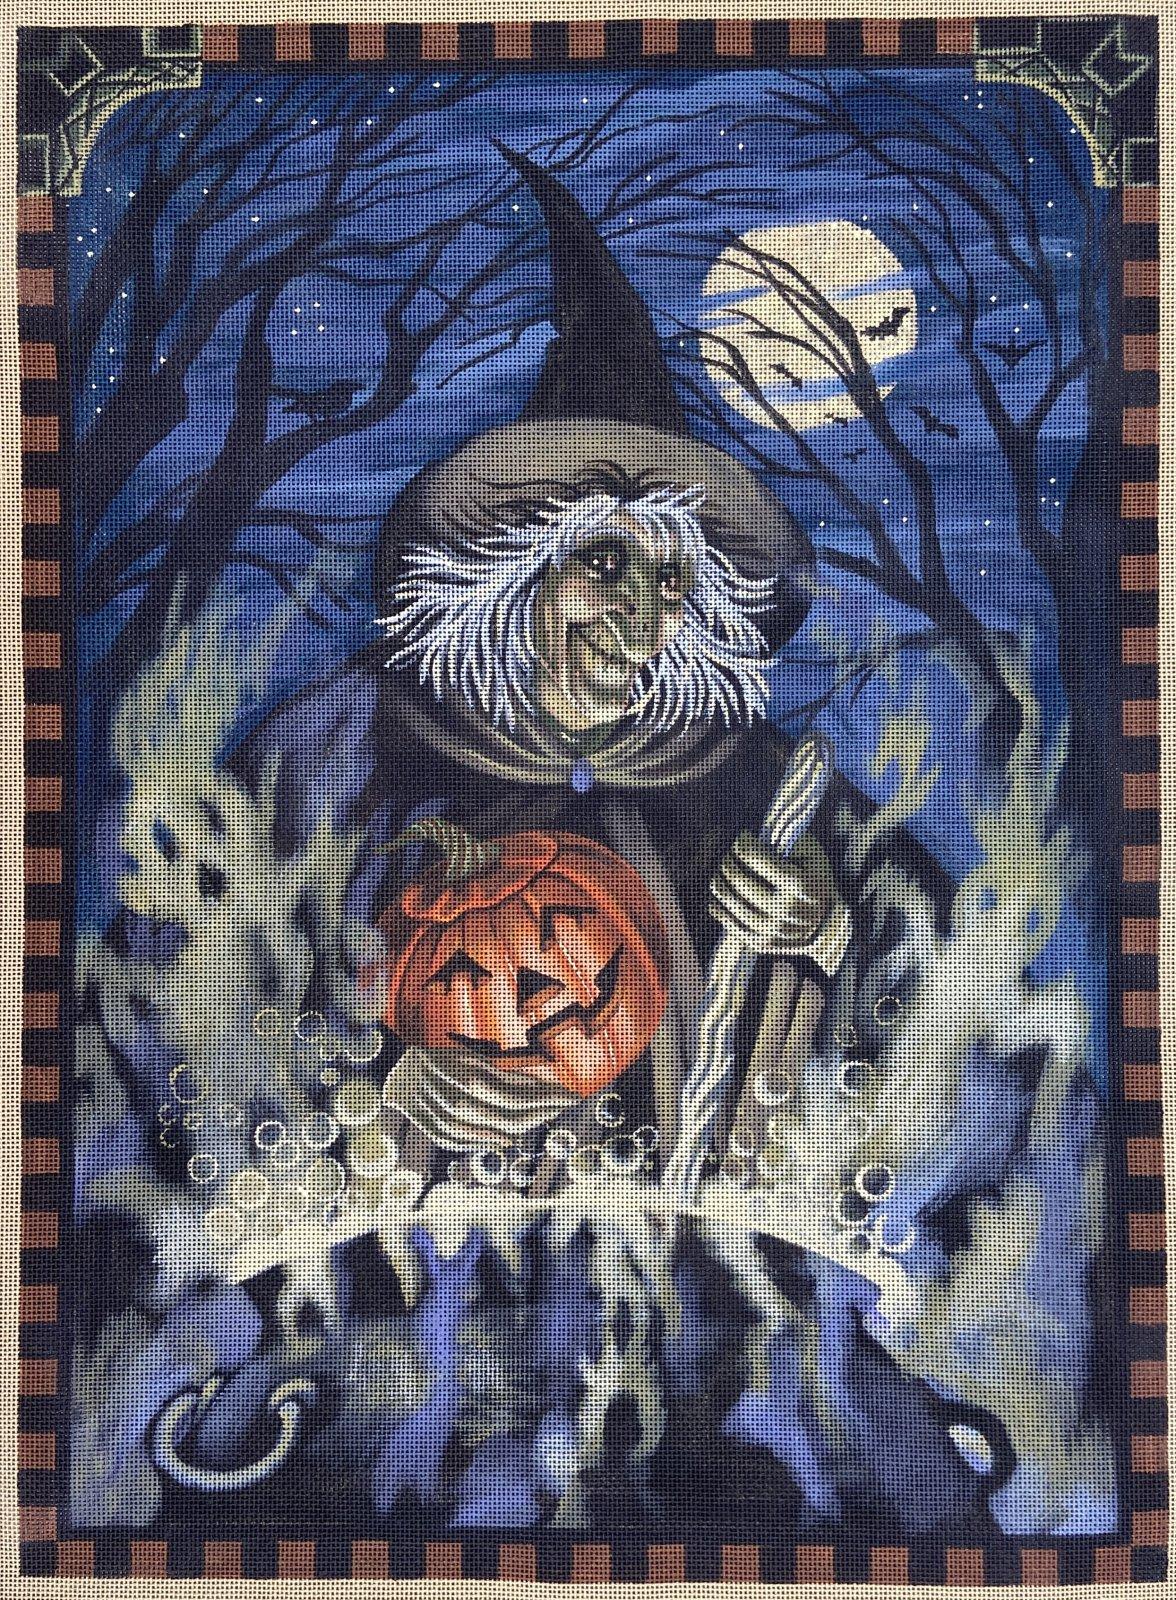 TTAP443 Witches Brew on Halloween Susan Roberts